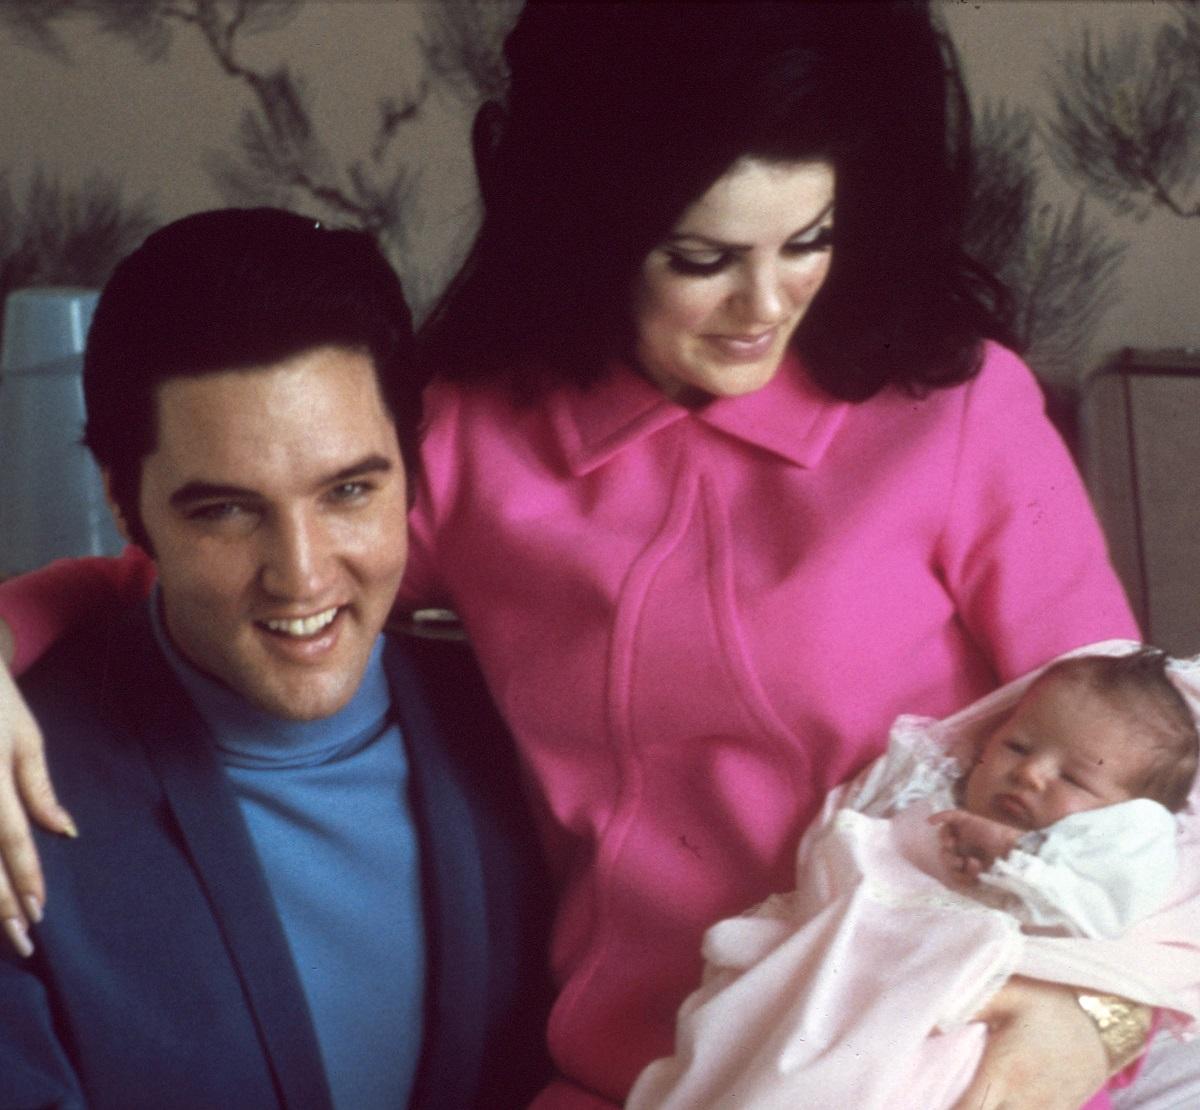 The Presleys in 1968